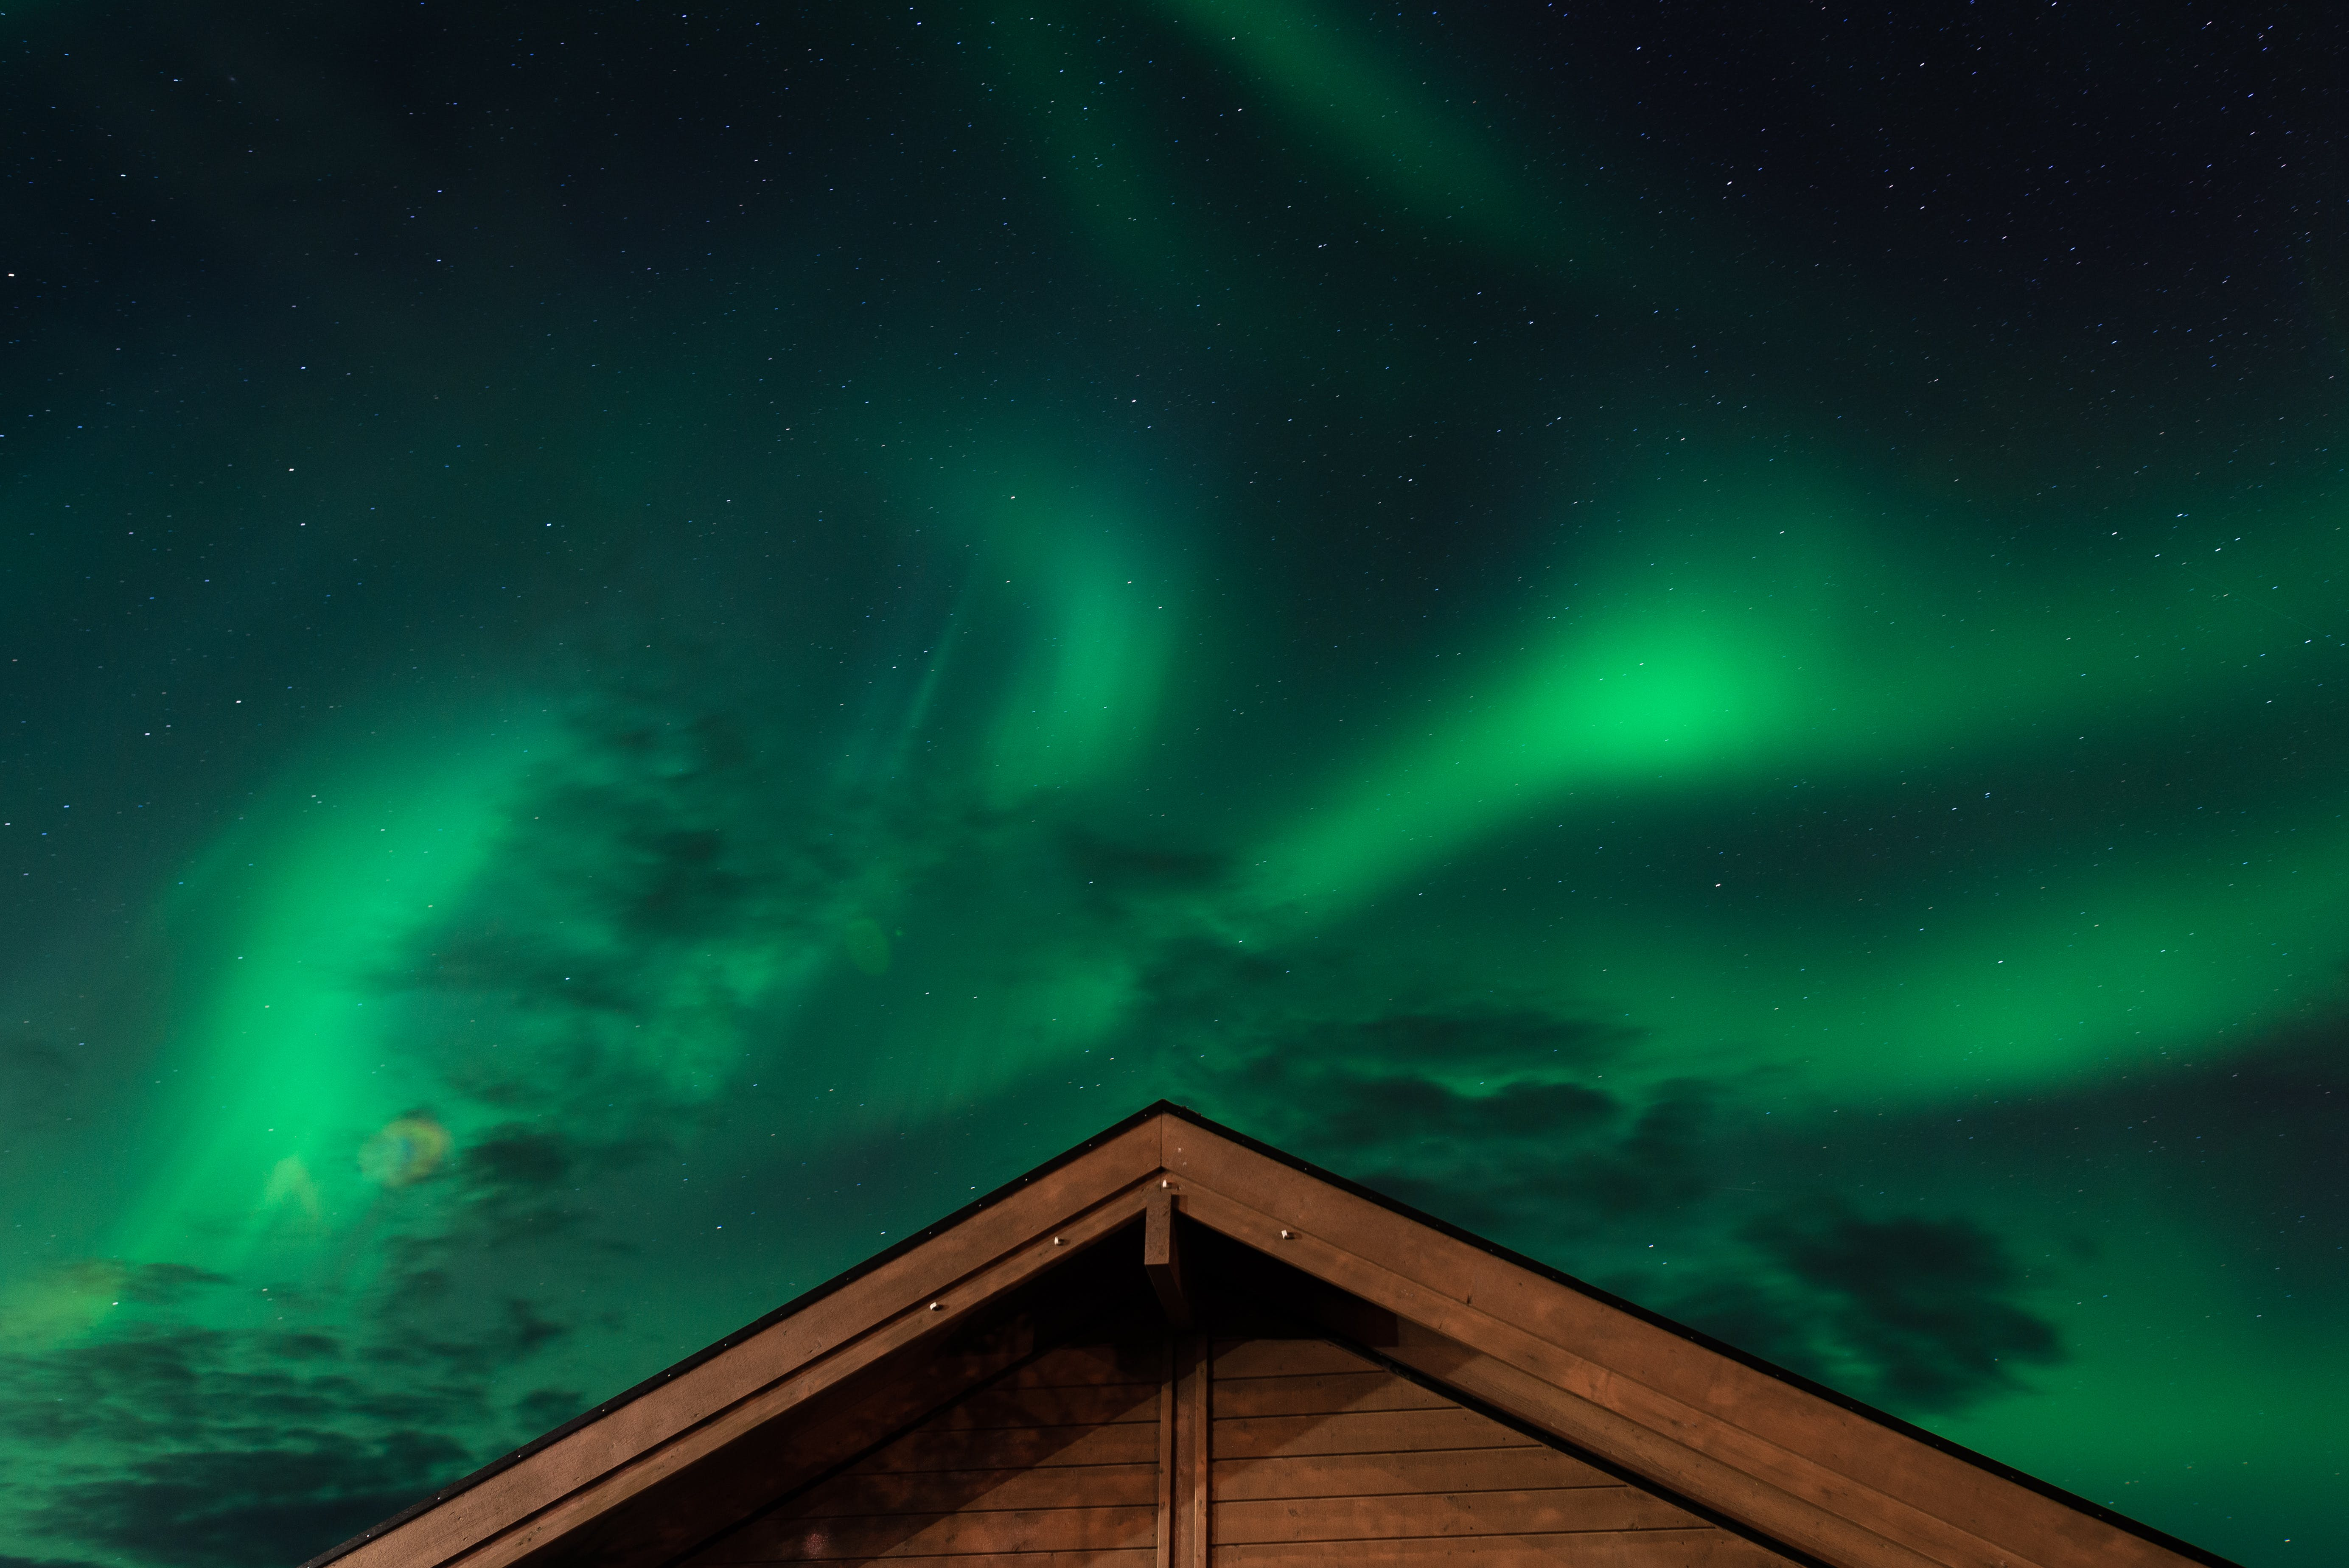 astronomy, atmosphere, aurora